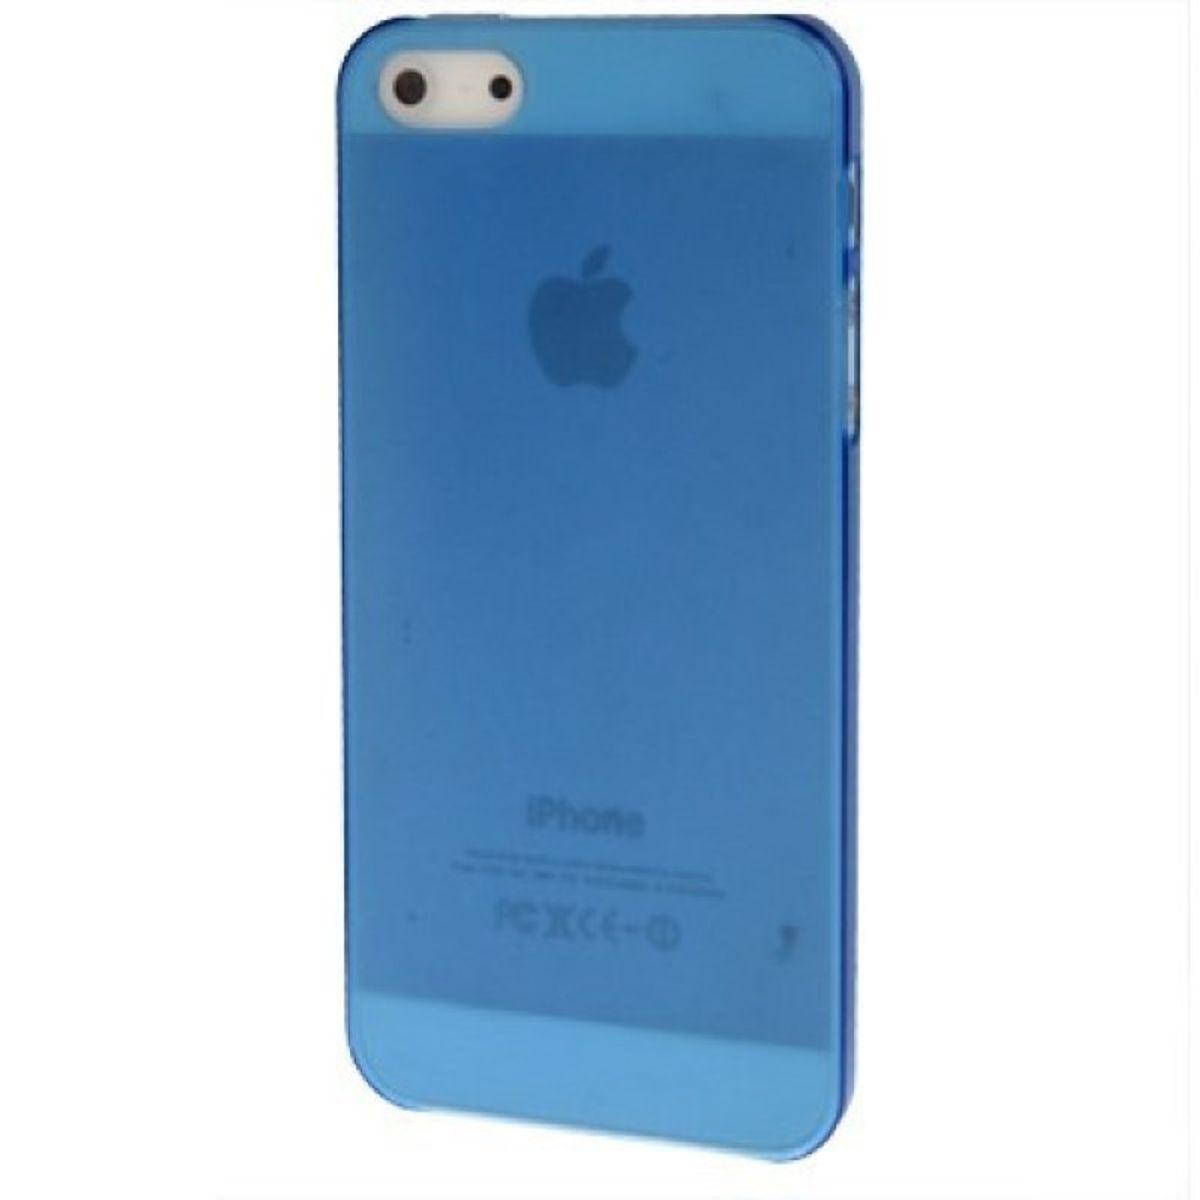 Schutzhülle Ultra Dünn Hülle für Apple iPhone 5 / 5s Transparent Blau